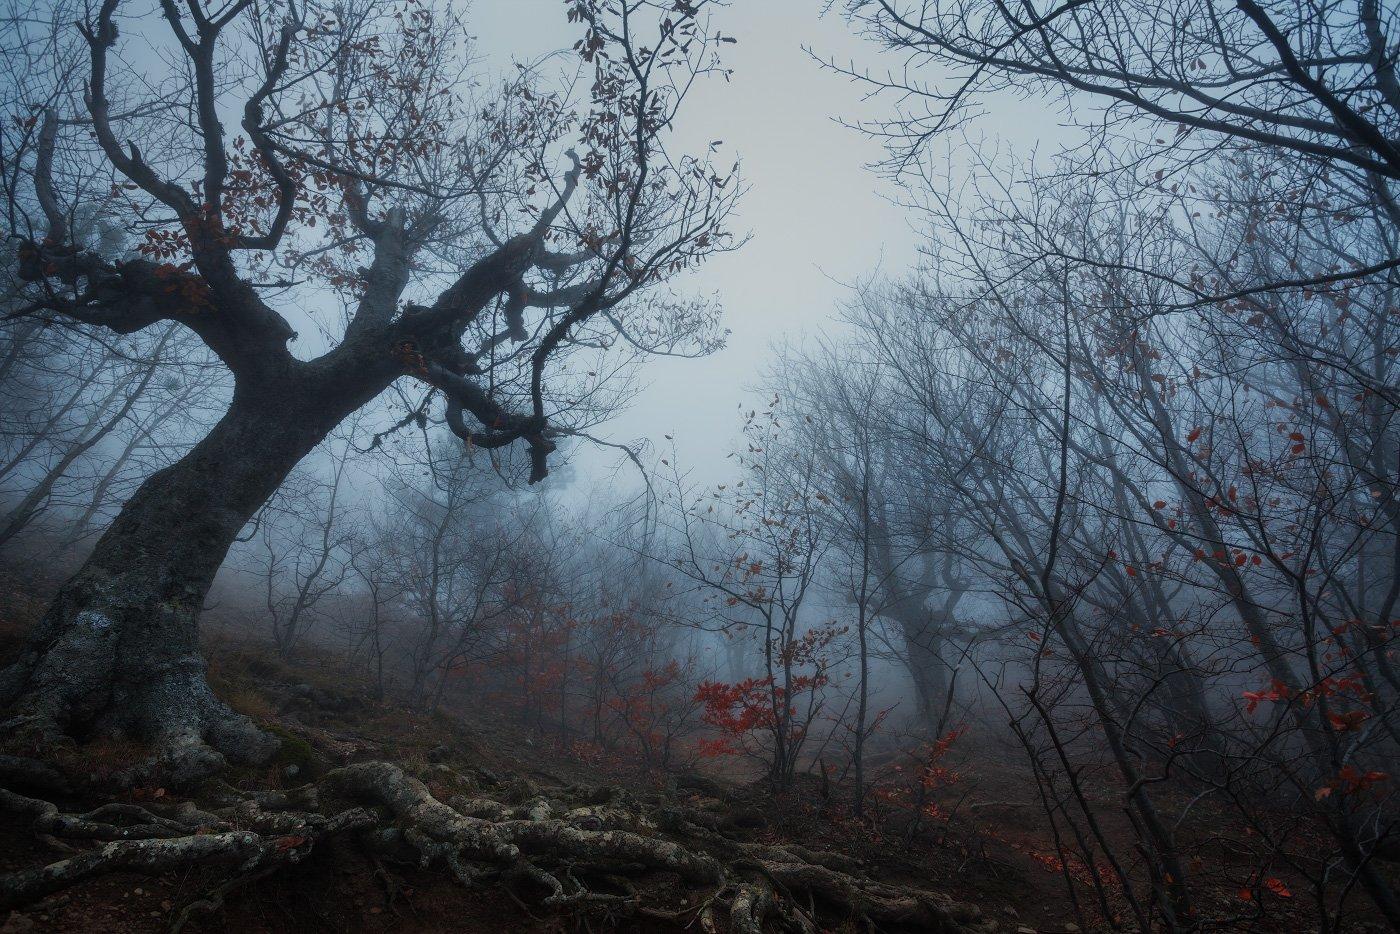 Готика, Демерджи, Осень, Туман, Андрей Уляшев (Mercand)